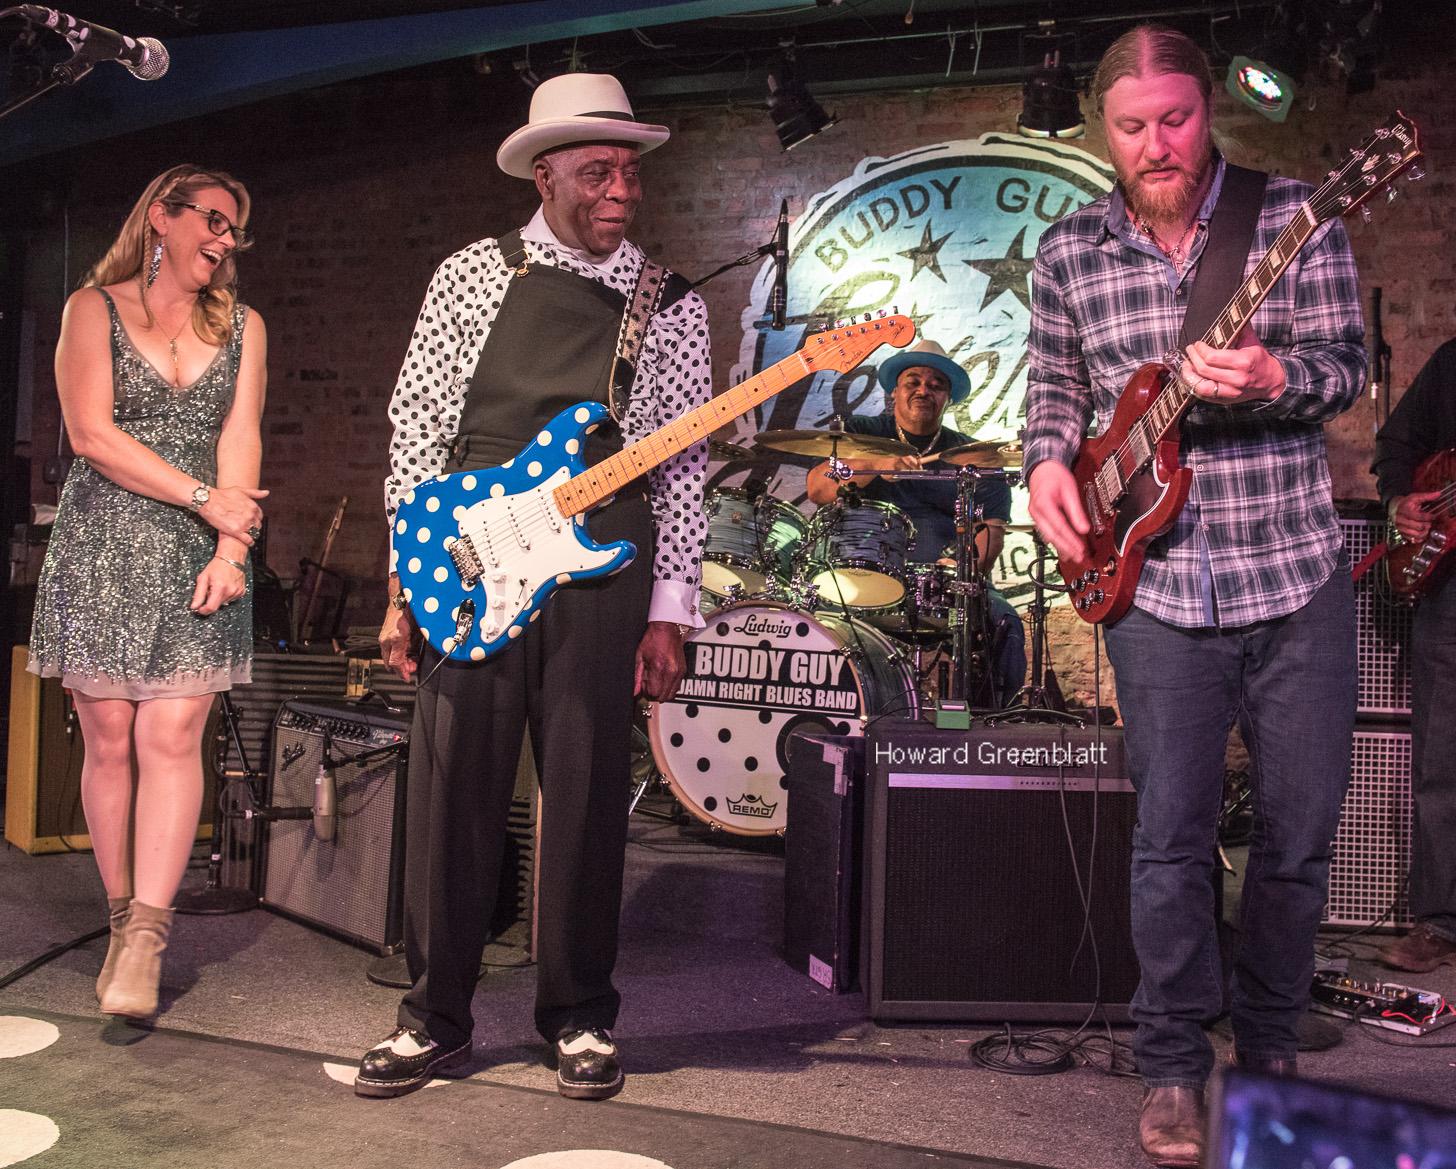 PHOTOS / VIDEO   Derek & Susan Join Buddy Guy Late Night at Legends 1/21/17